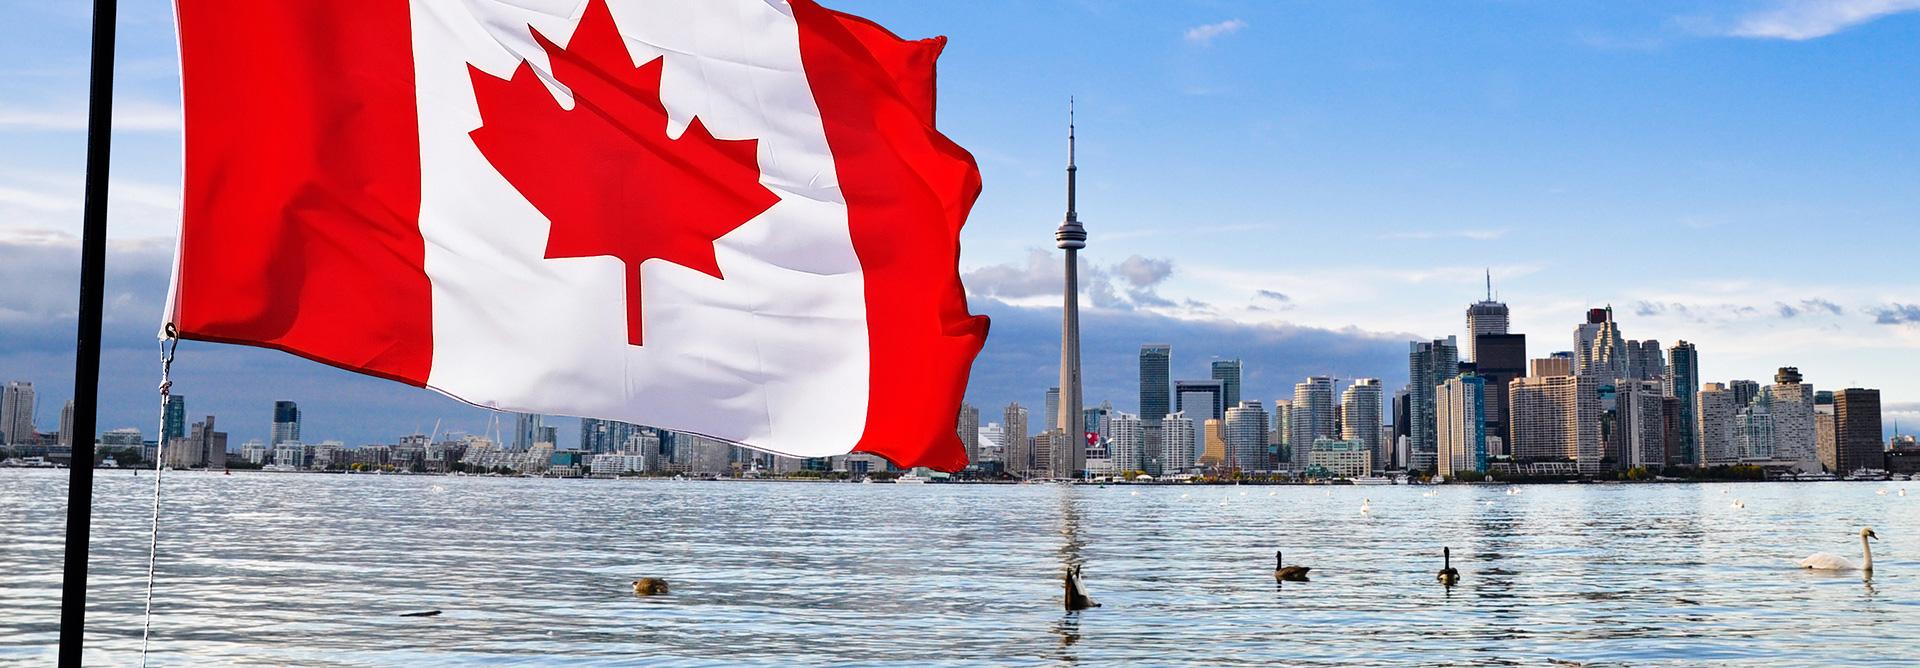 canadian flag 1920